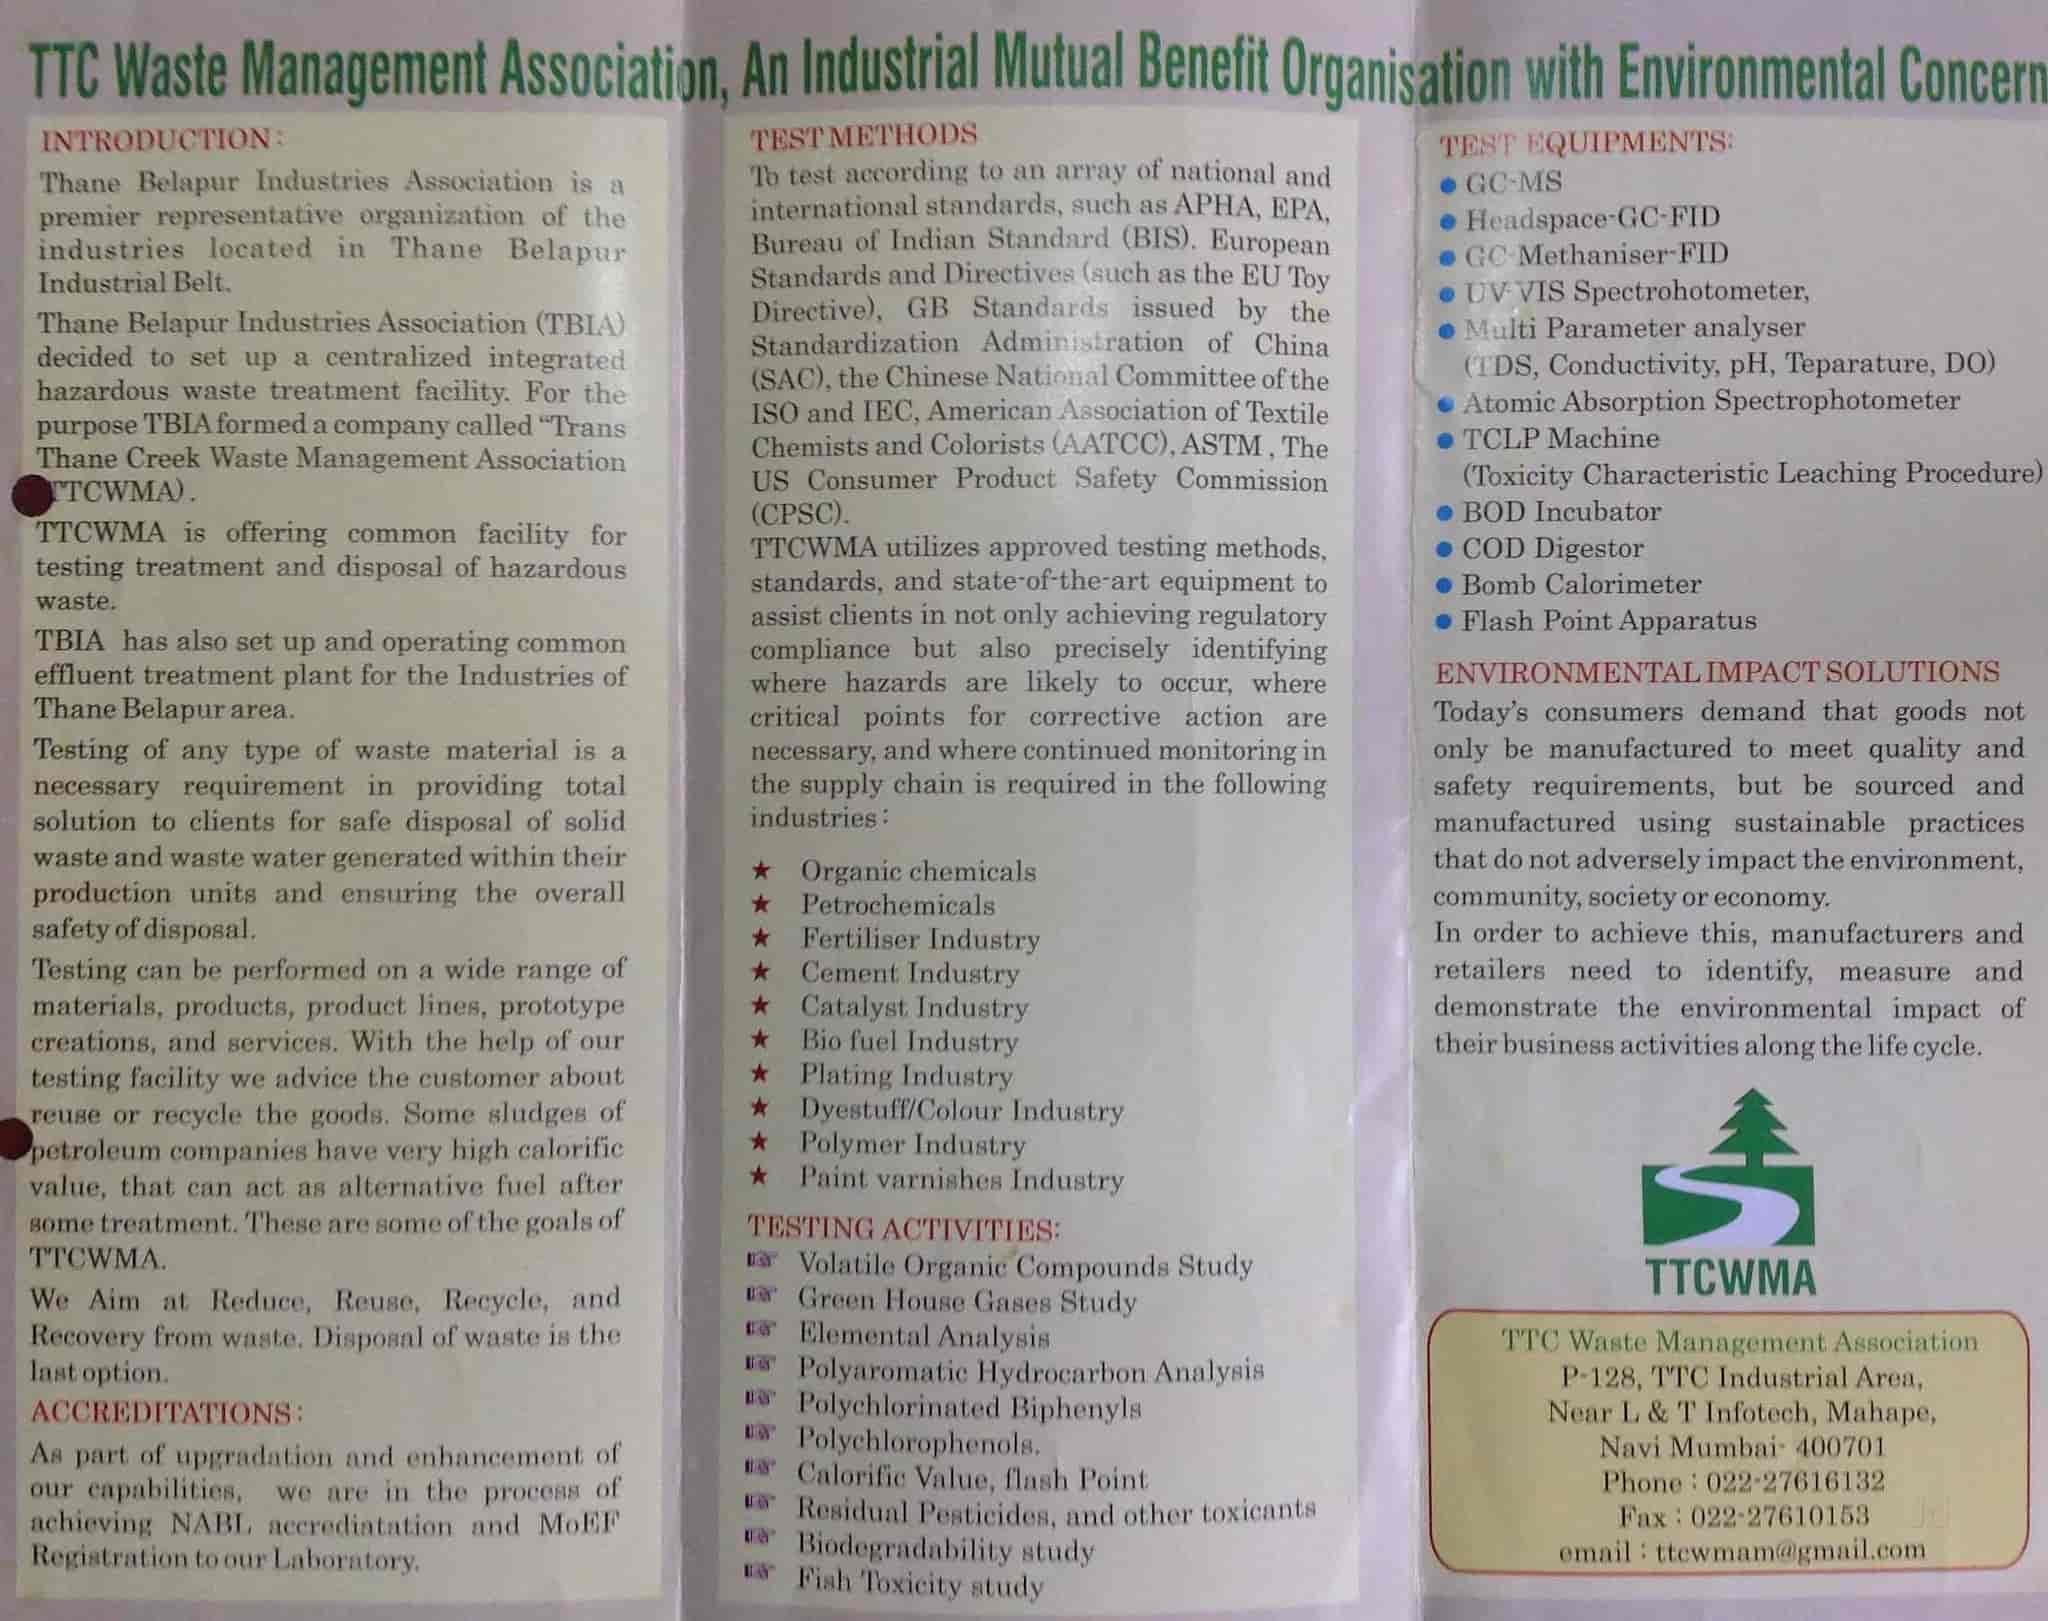 Trans Thane Creek Waste Management Association, Mahape - Laboratory